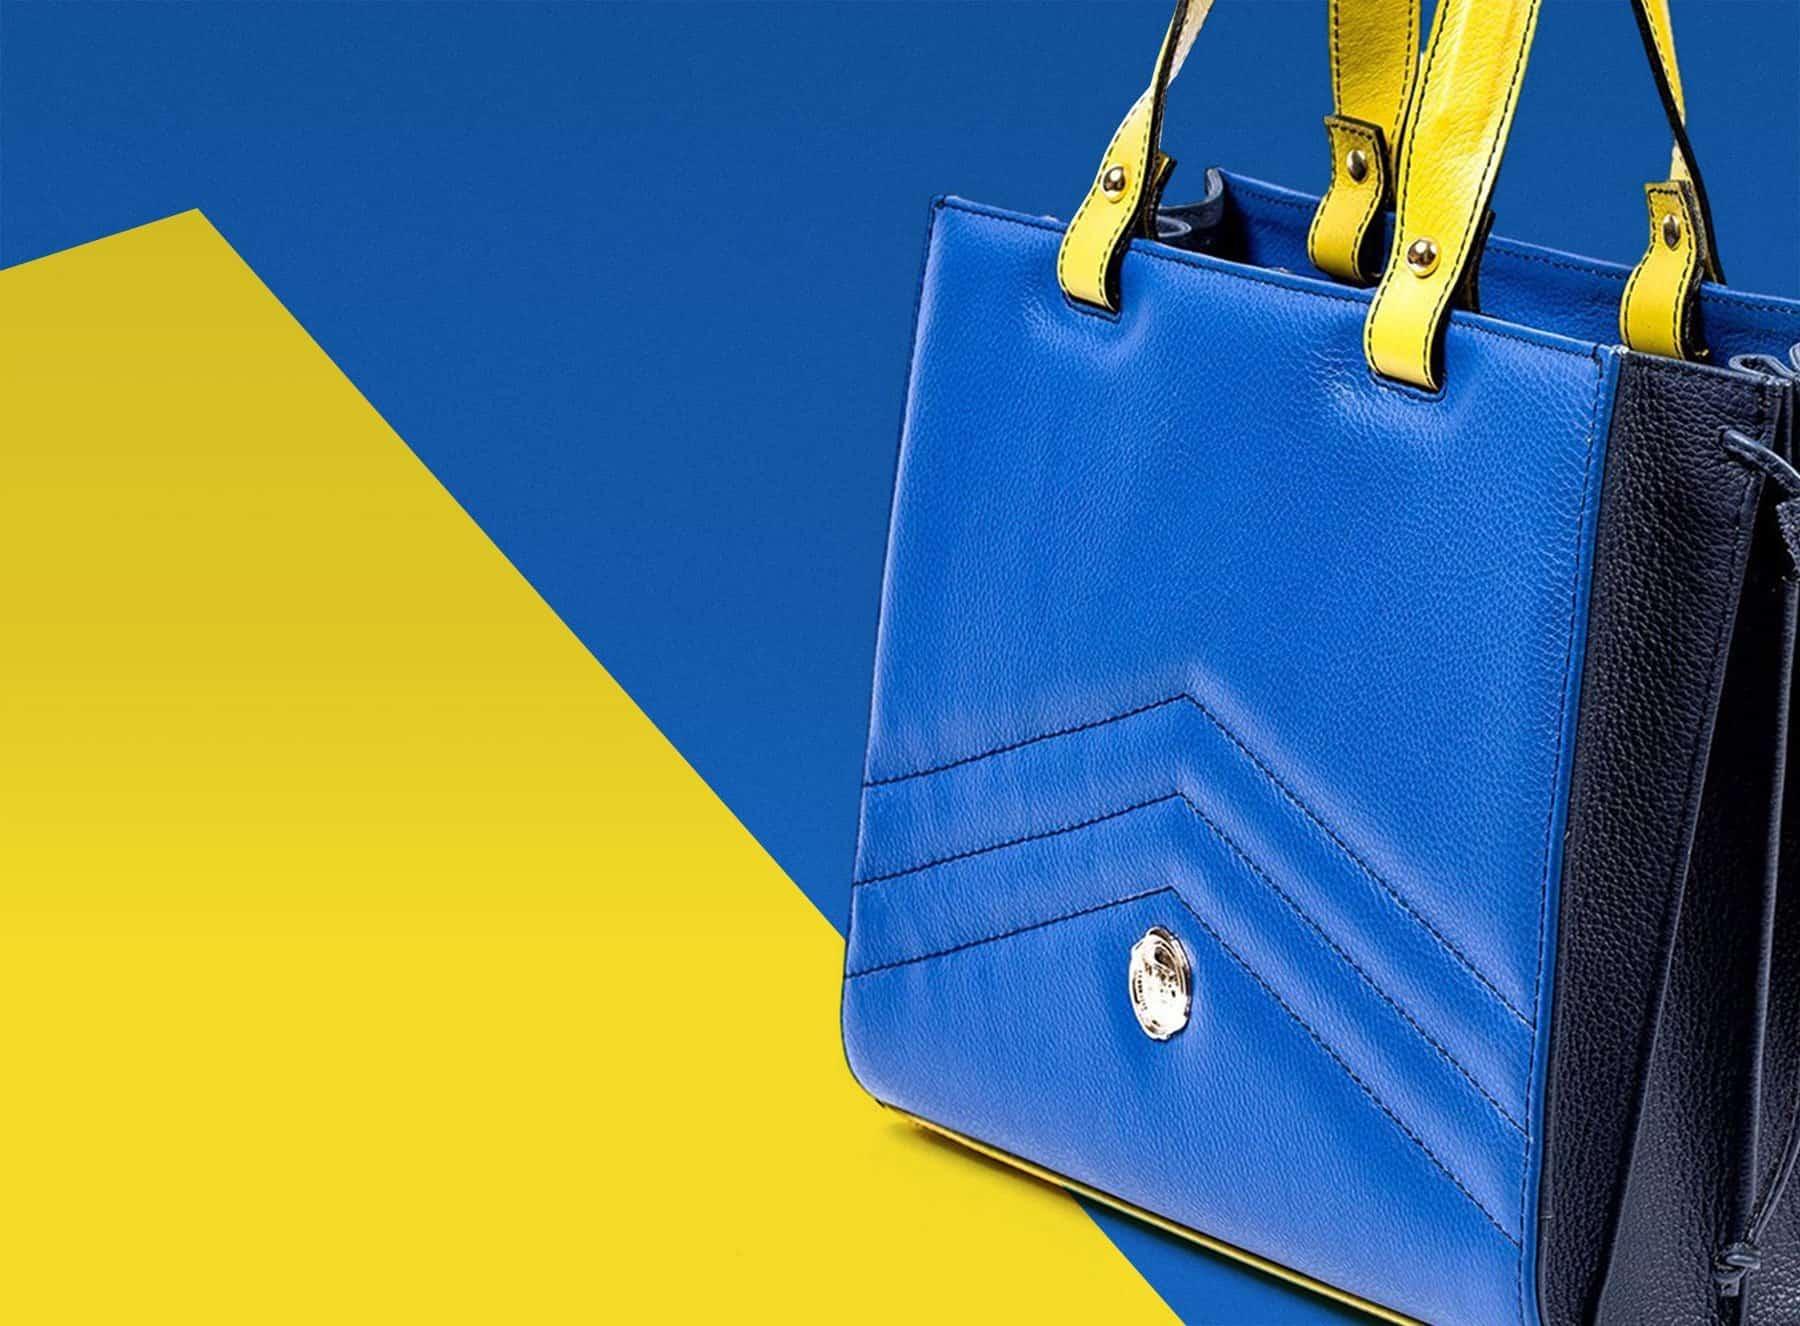 Bolso de piel azul con asas amarillas